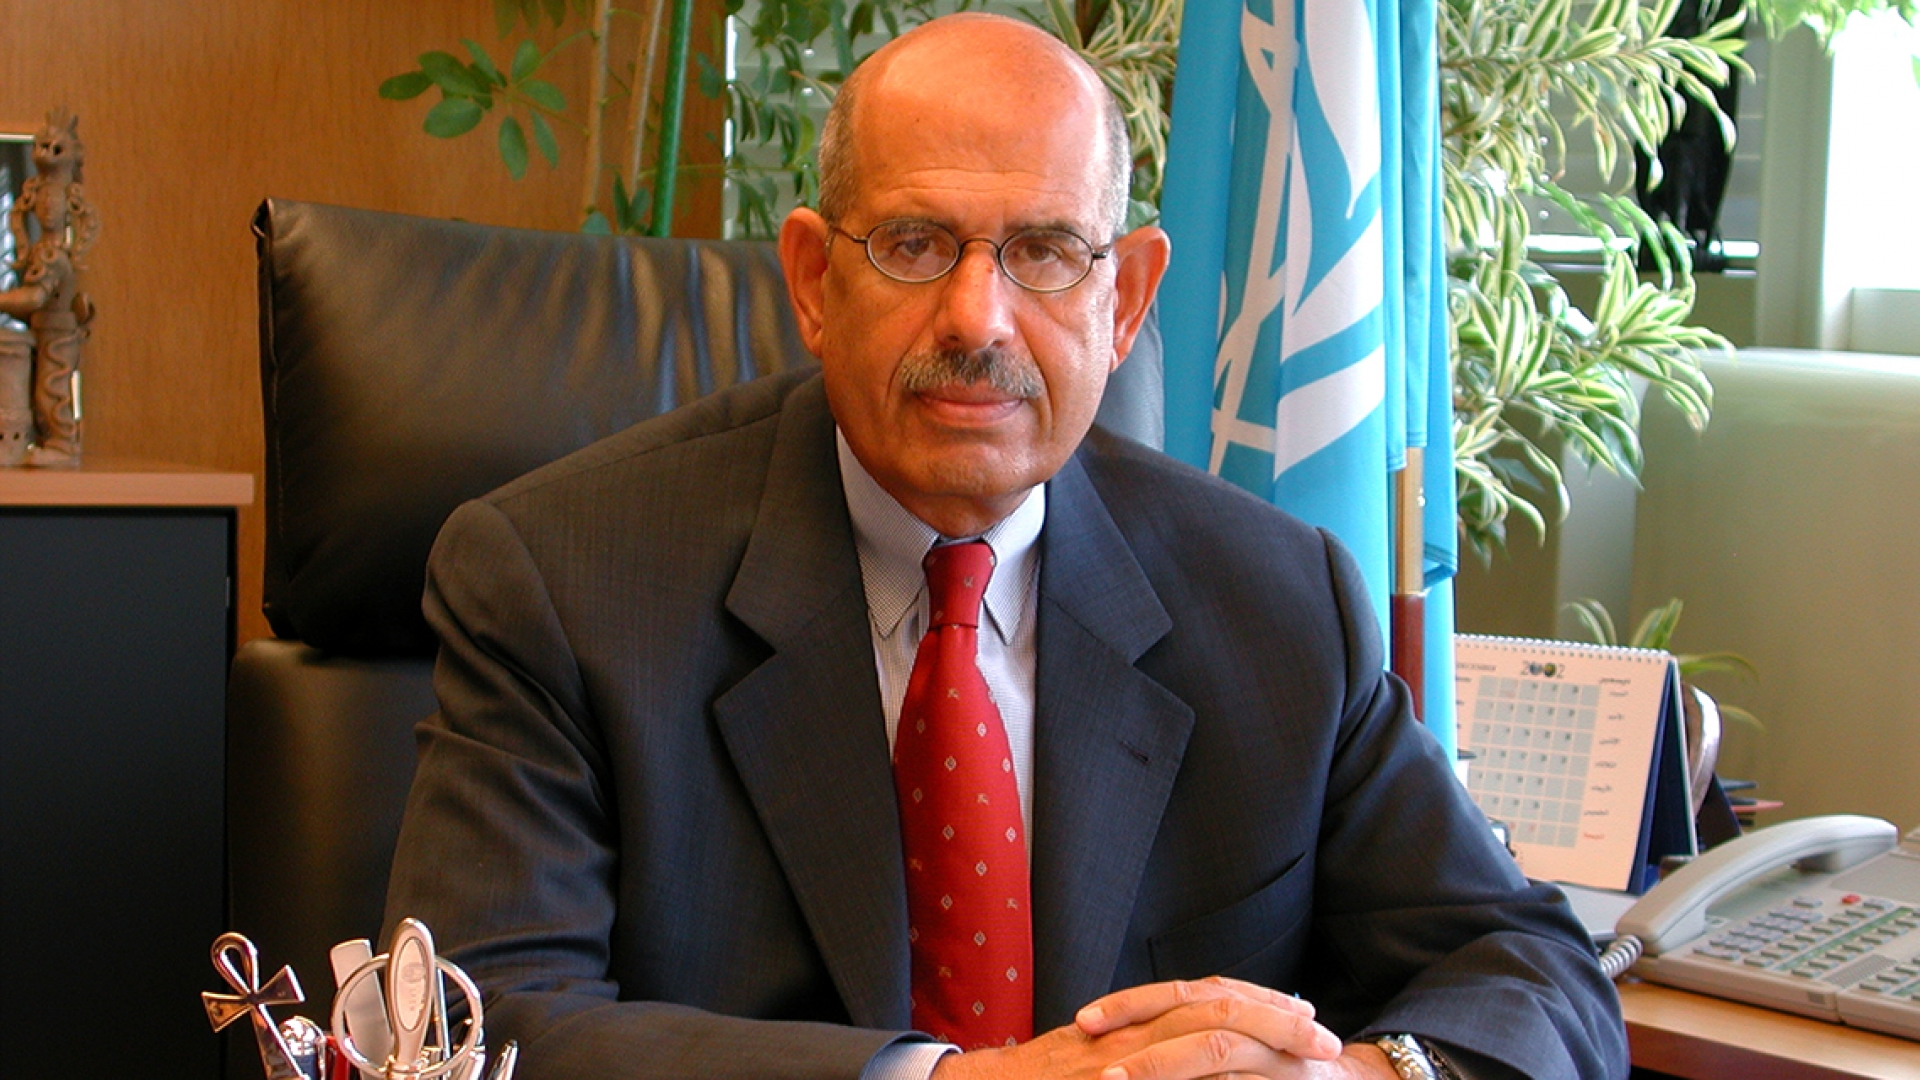 Peaceful Uses of Nuclear Energy: Meeting Societal Needs | IAEA